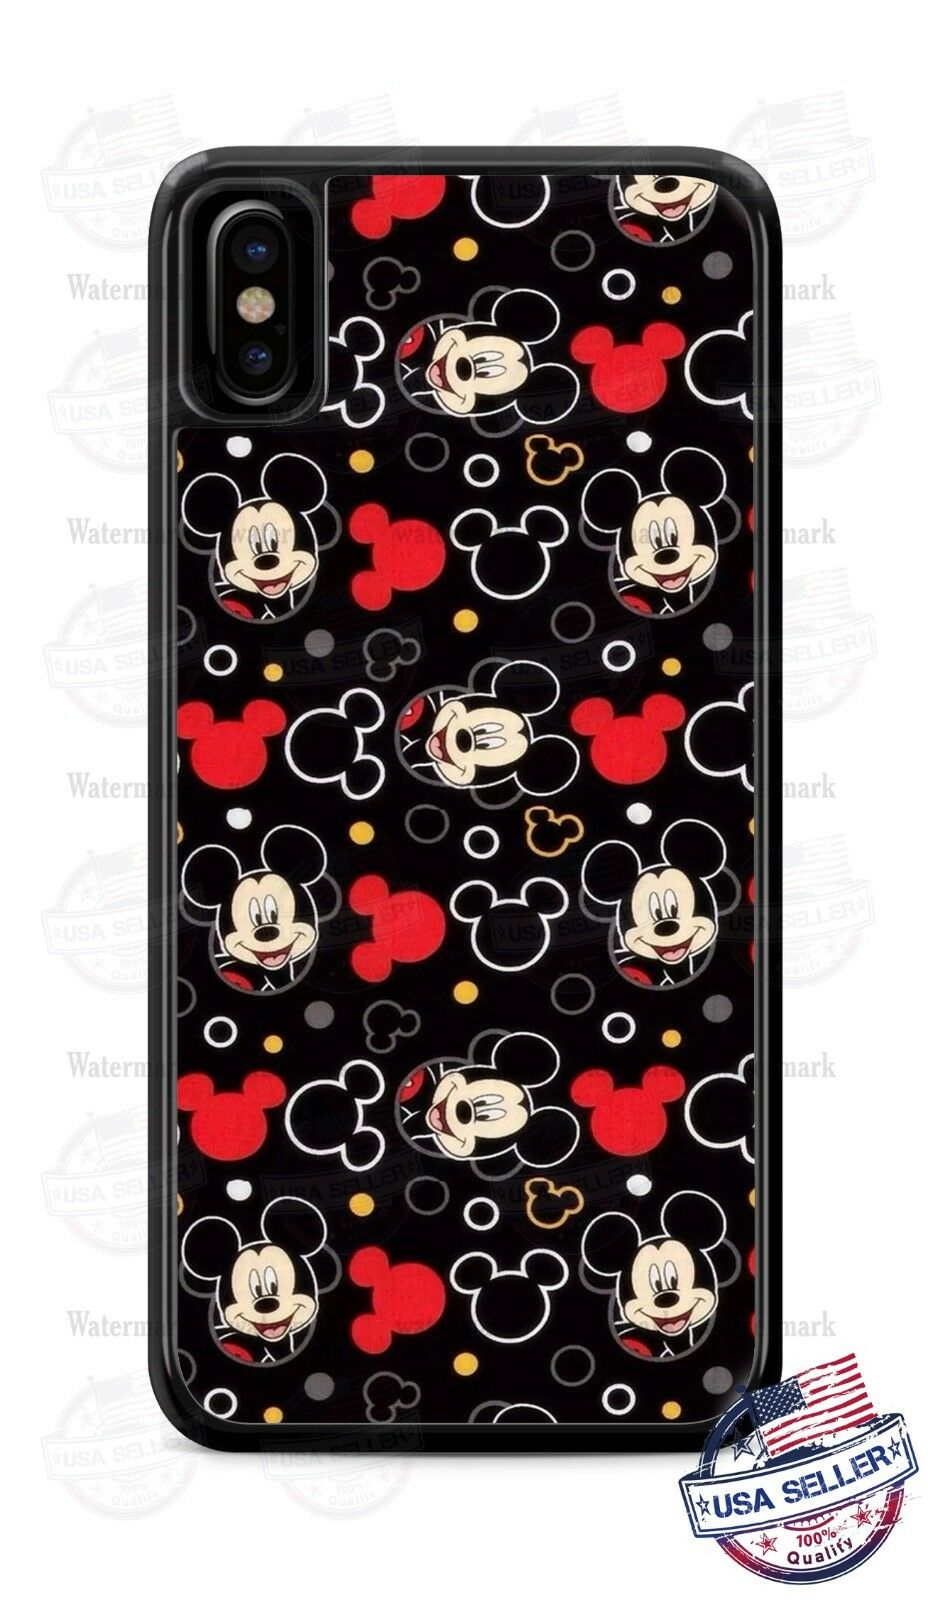 Mickey Mouse Collage Z1 Diseño Cubierta de la caja del teléfono para iPhone Xs Max Samsung LG etc.